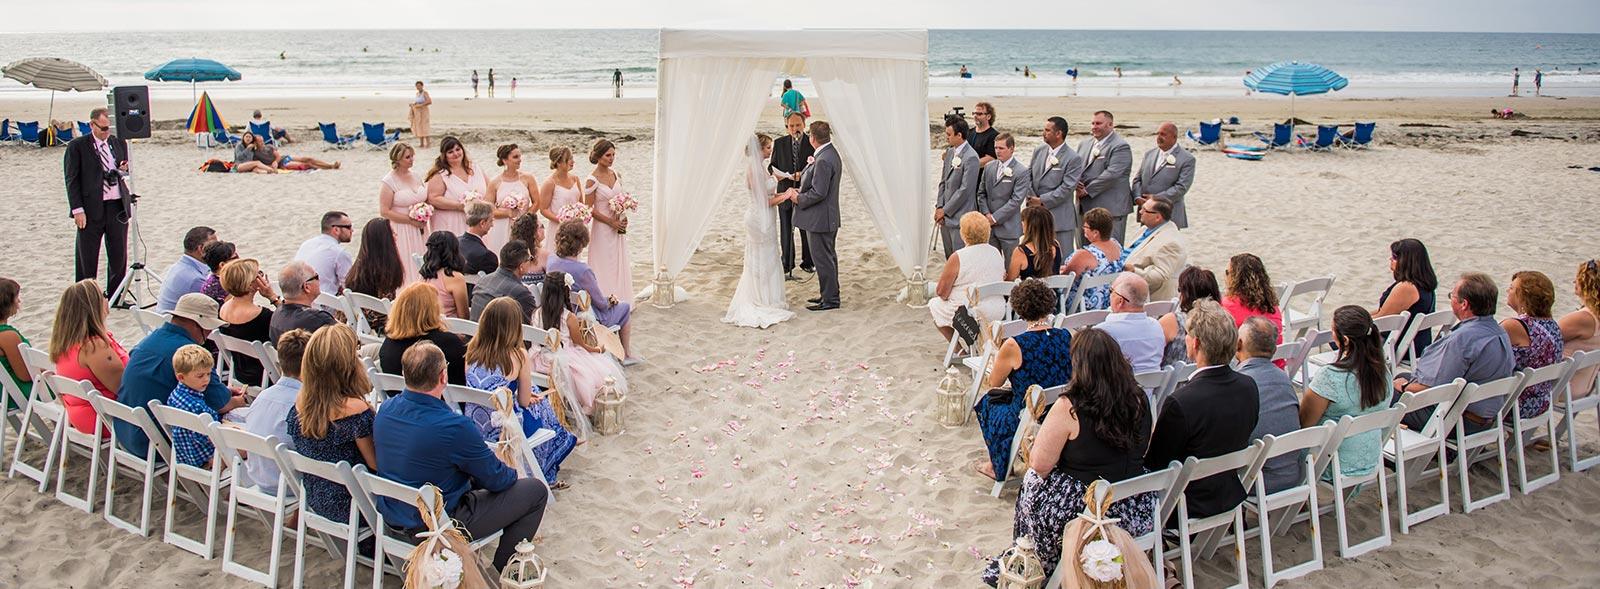 The Best Wedding Venue Decor Ideas